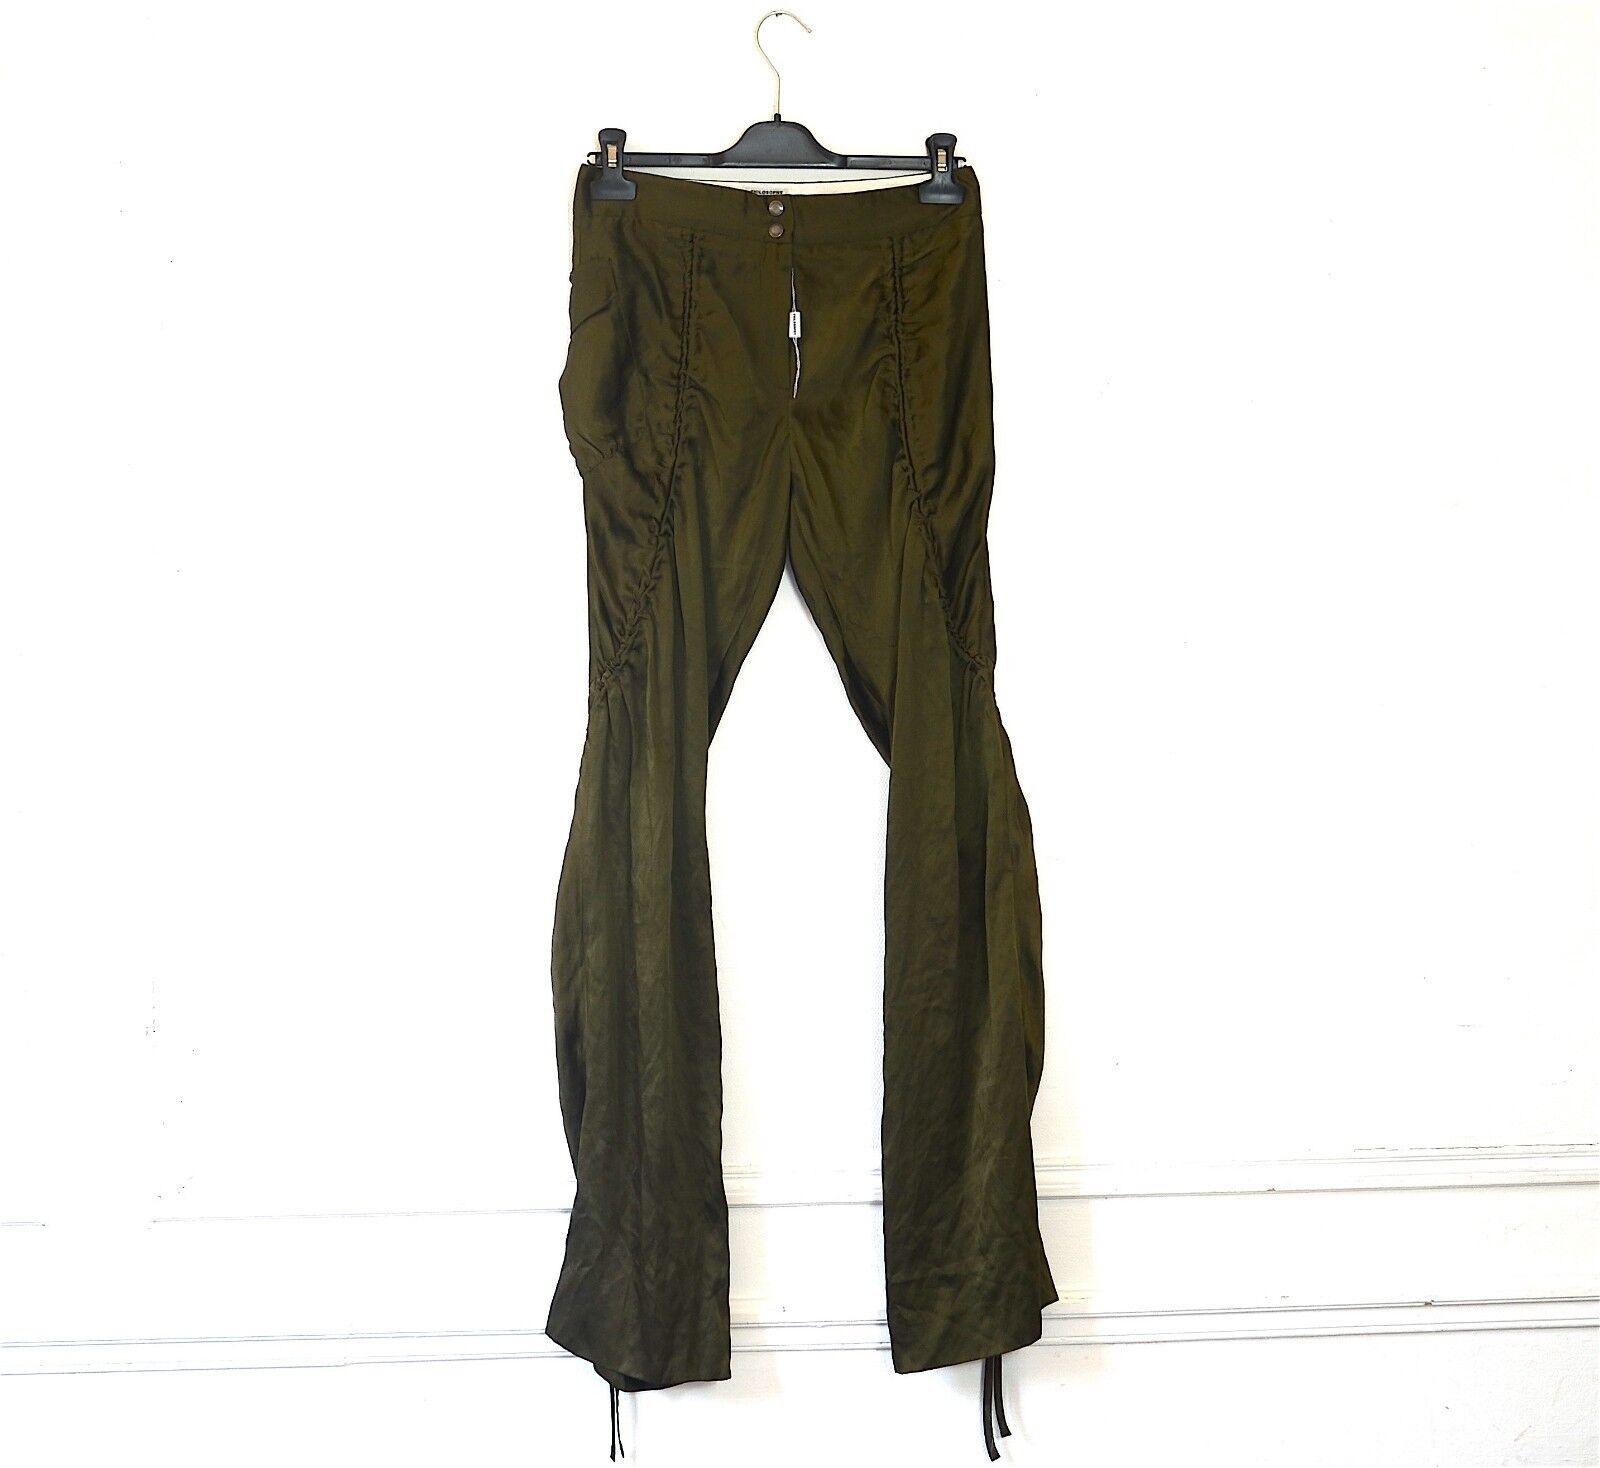 Pantalon type sarouel en soie kaki PHILOSOPHY DI ALBERTA FERRETTI. T 36 FR. Silk